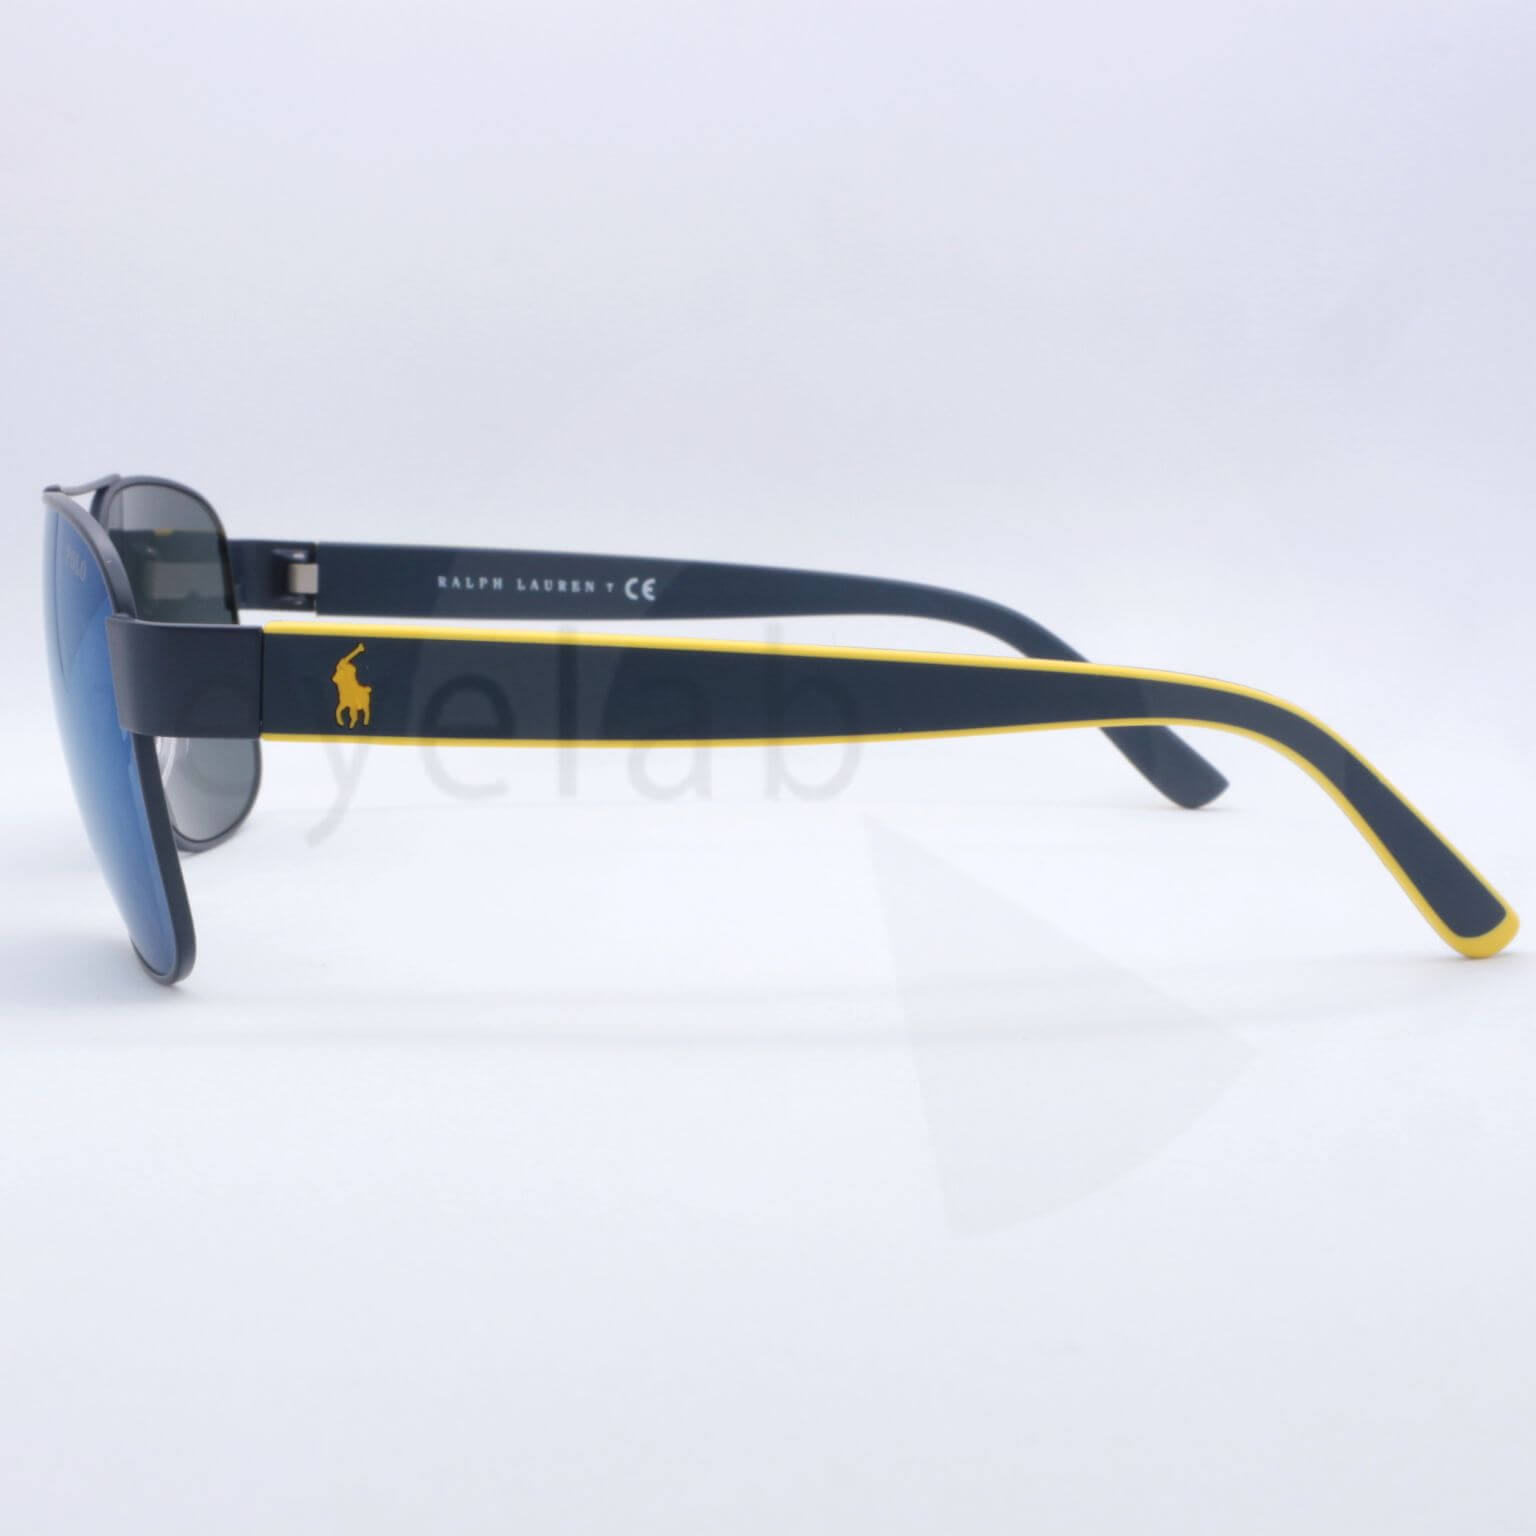 84249a22e5 Polo Ralph Lauren 3122 930355 sunglasses ~ Οπτικά Eyelab